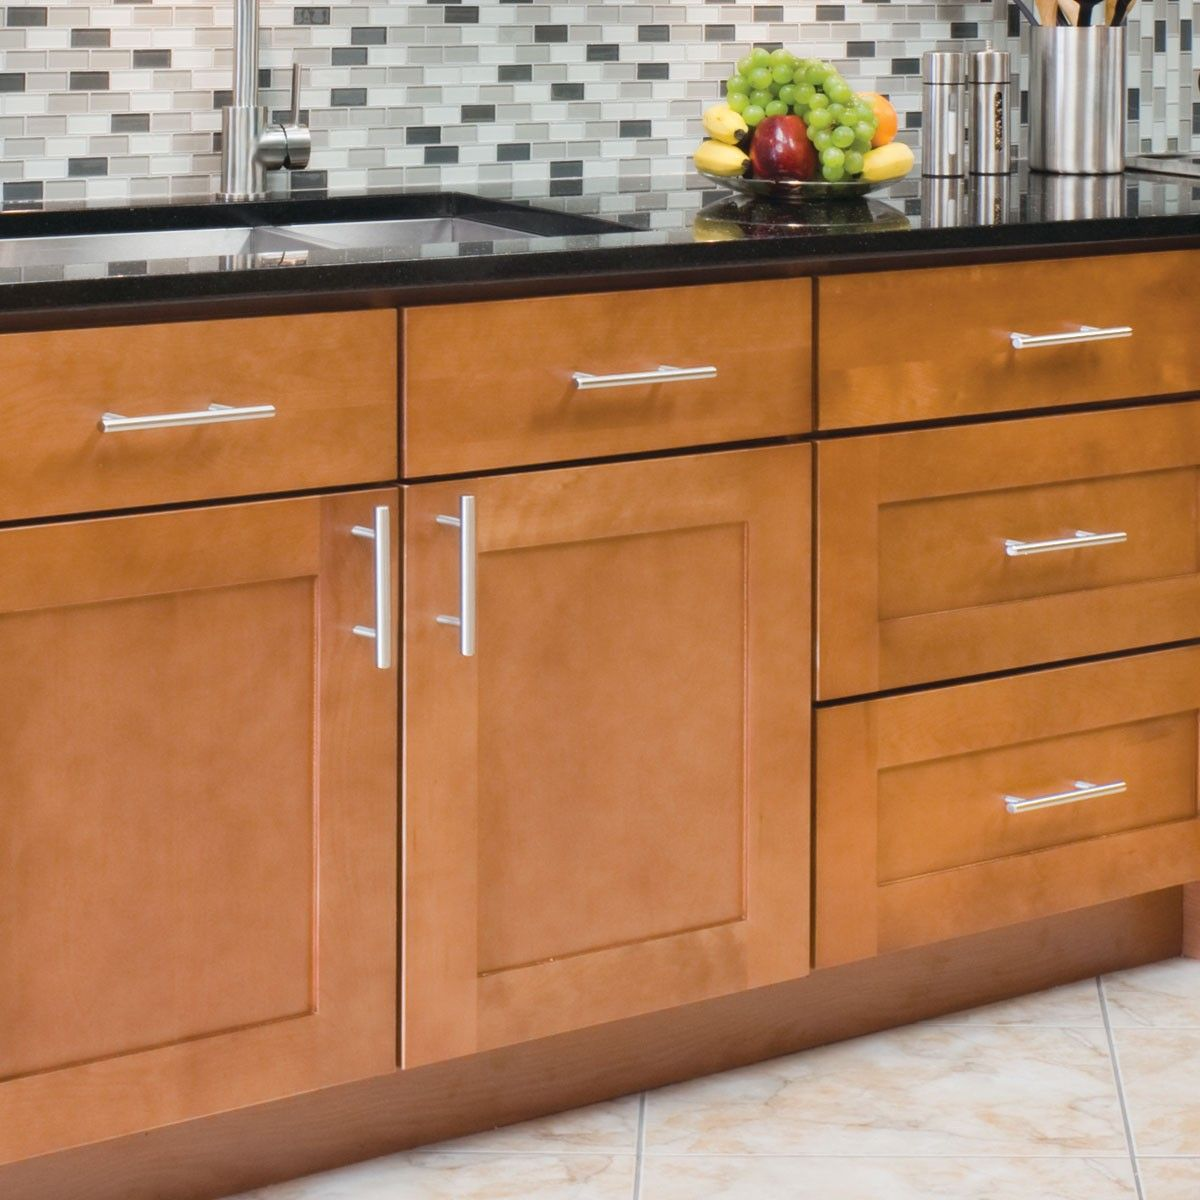 Bathroom cabinet hardware knobs  bathroom design 2017